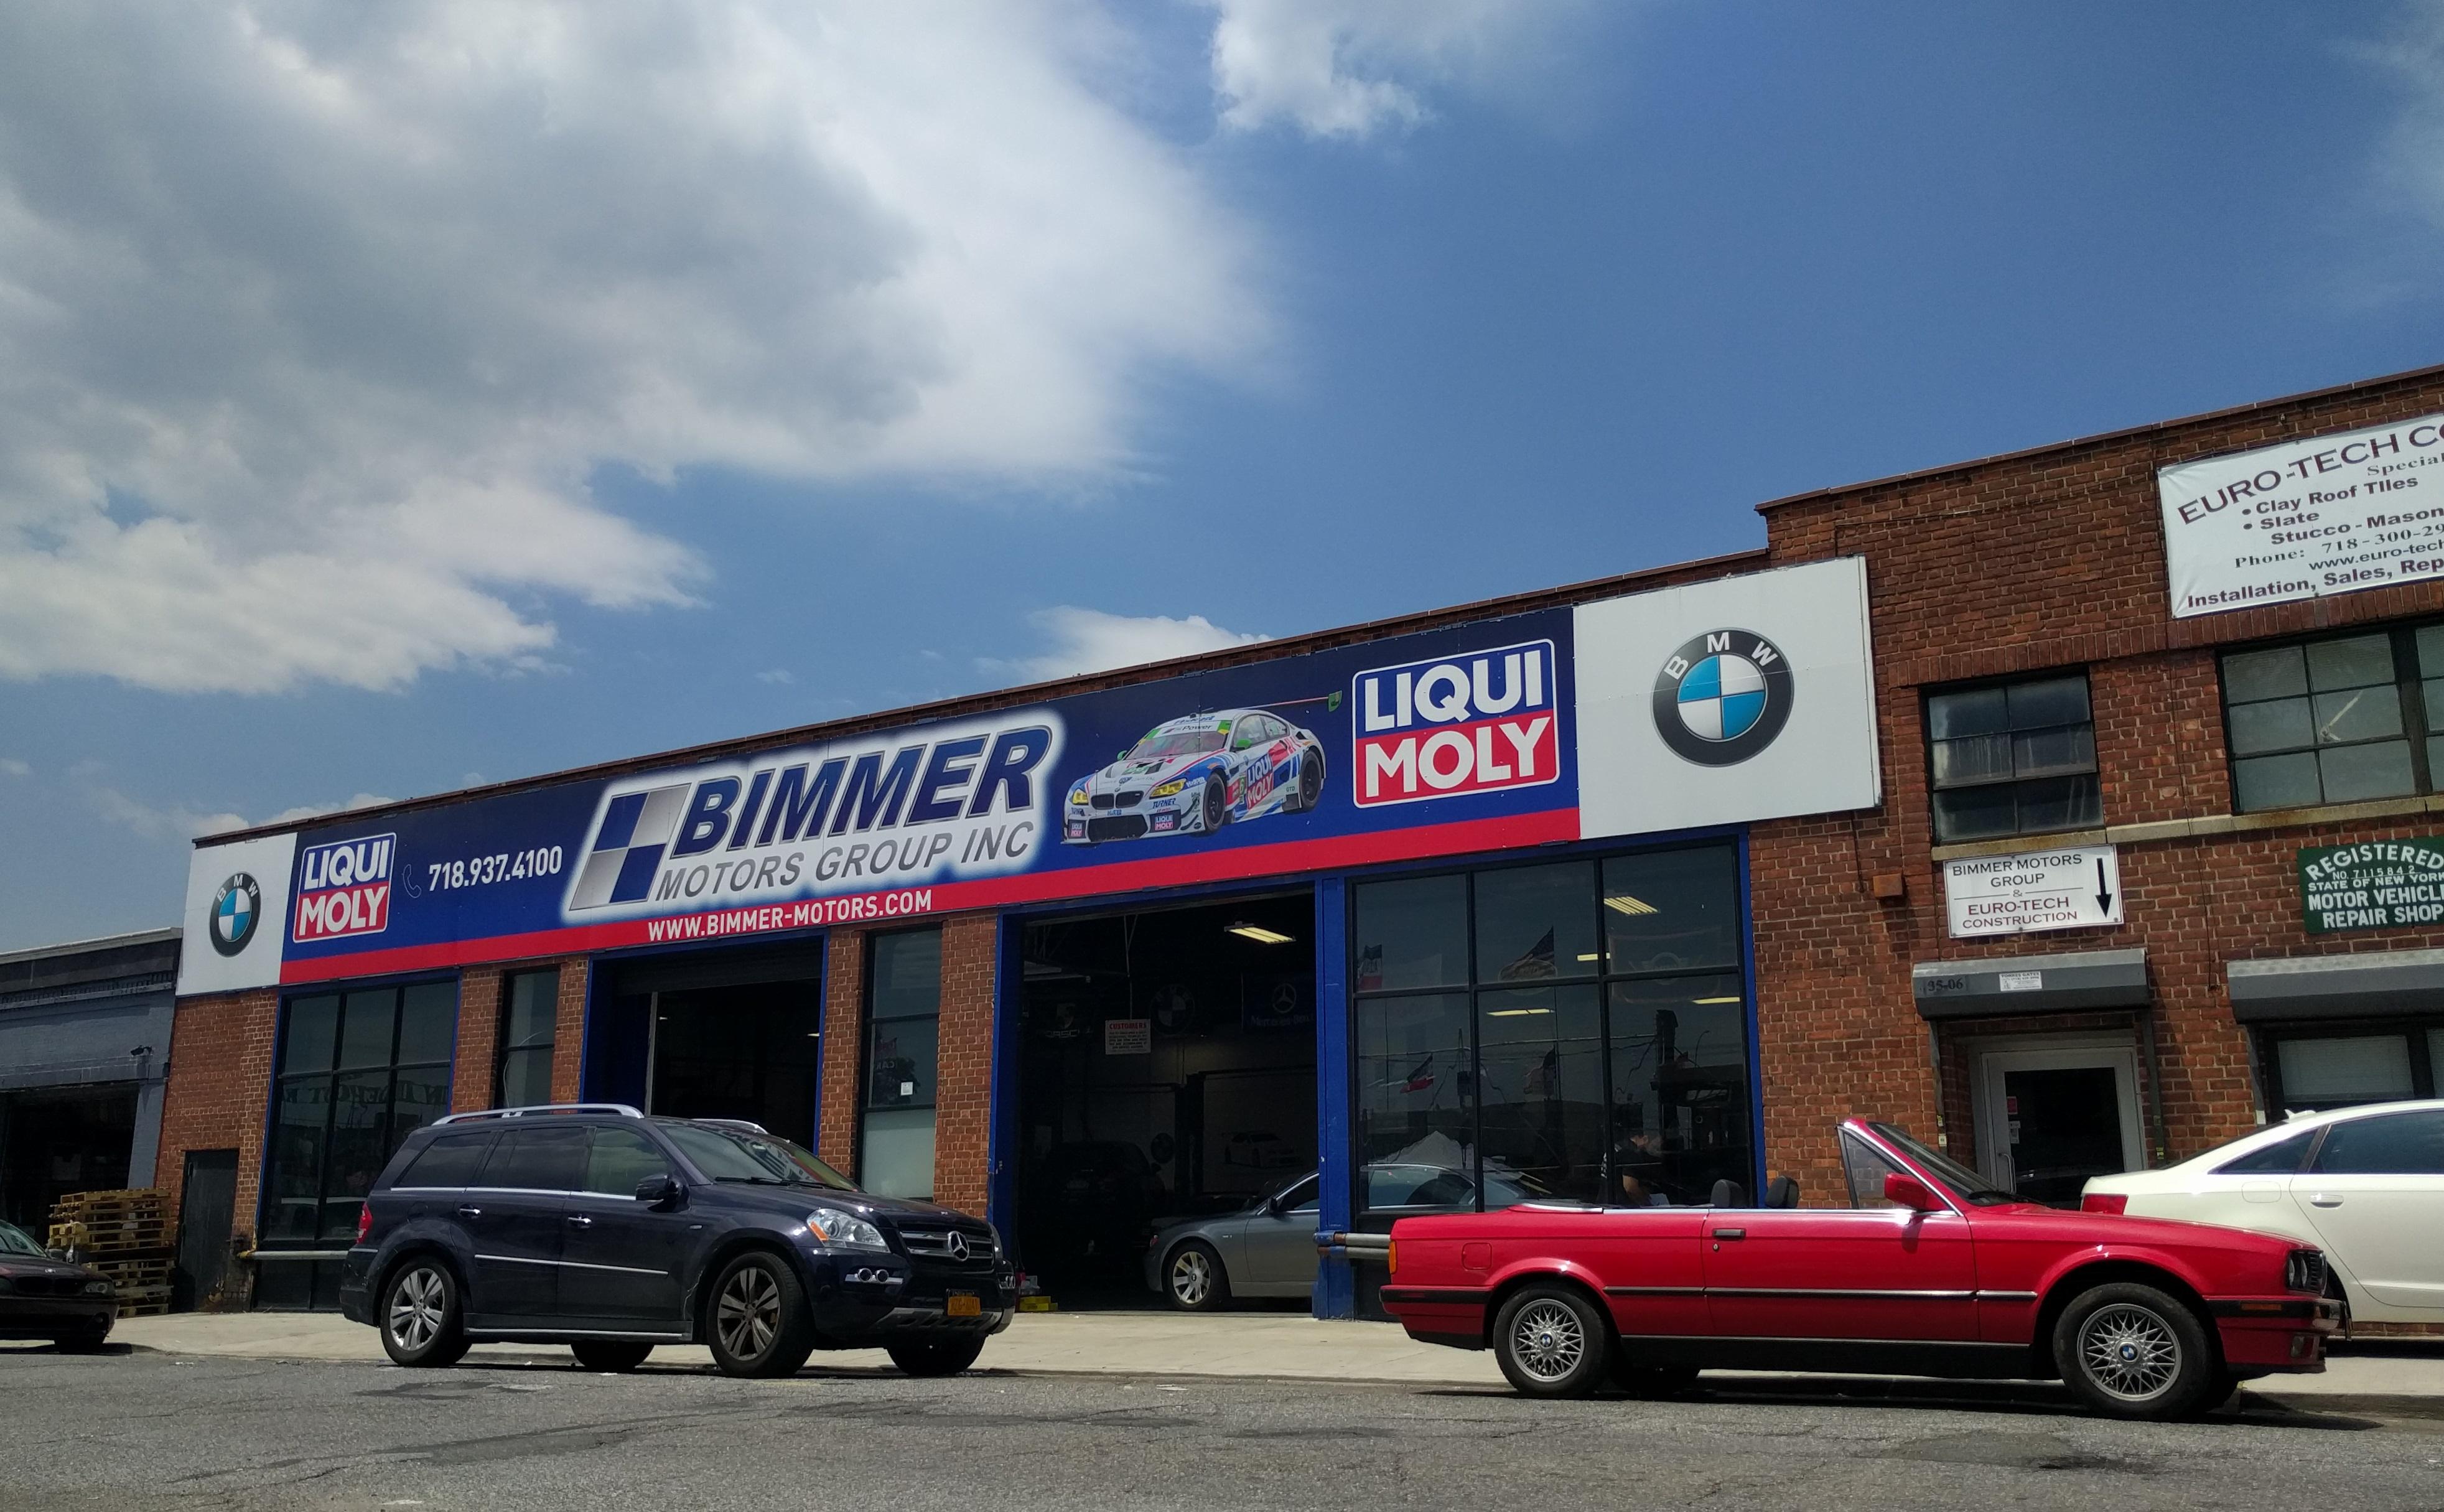 Bimmer Motors Group INC. Auto Shop